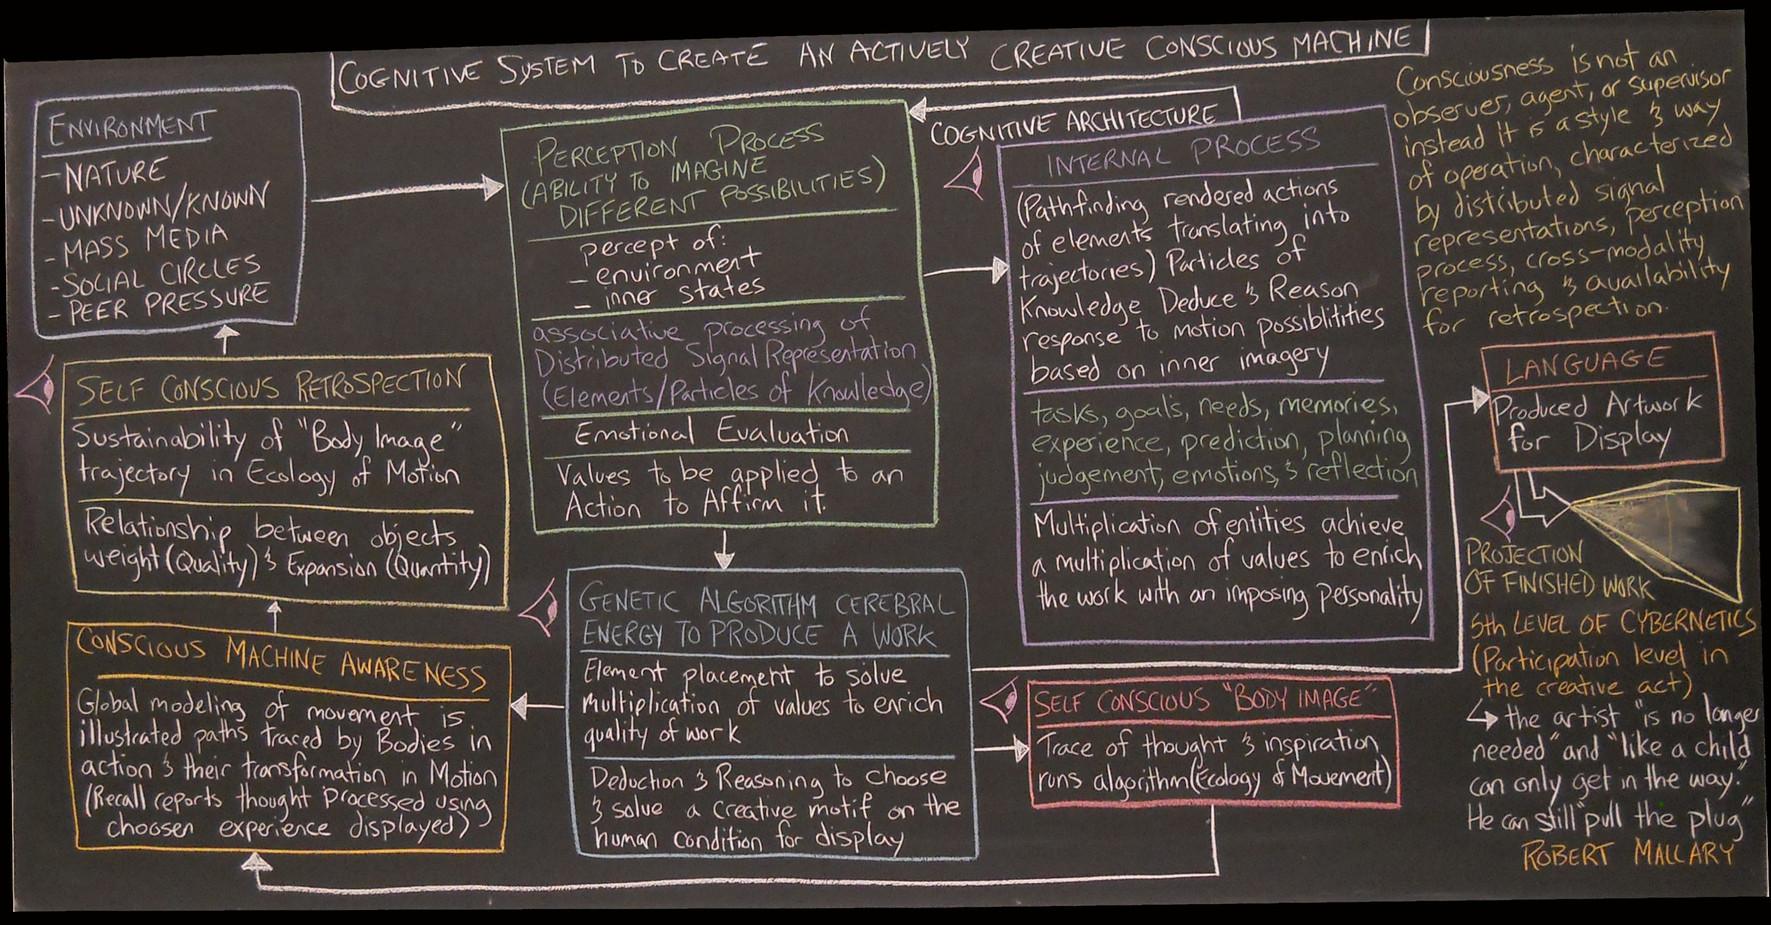 Photodynamic Conscious Machine Cognitive Architecture: Proposal Lecture Series